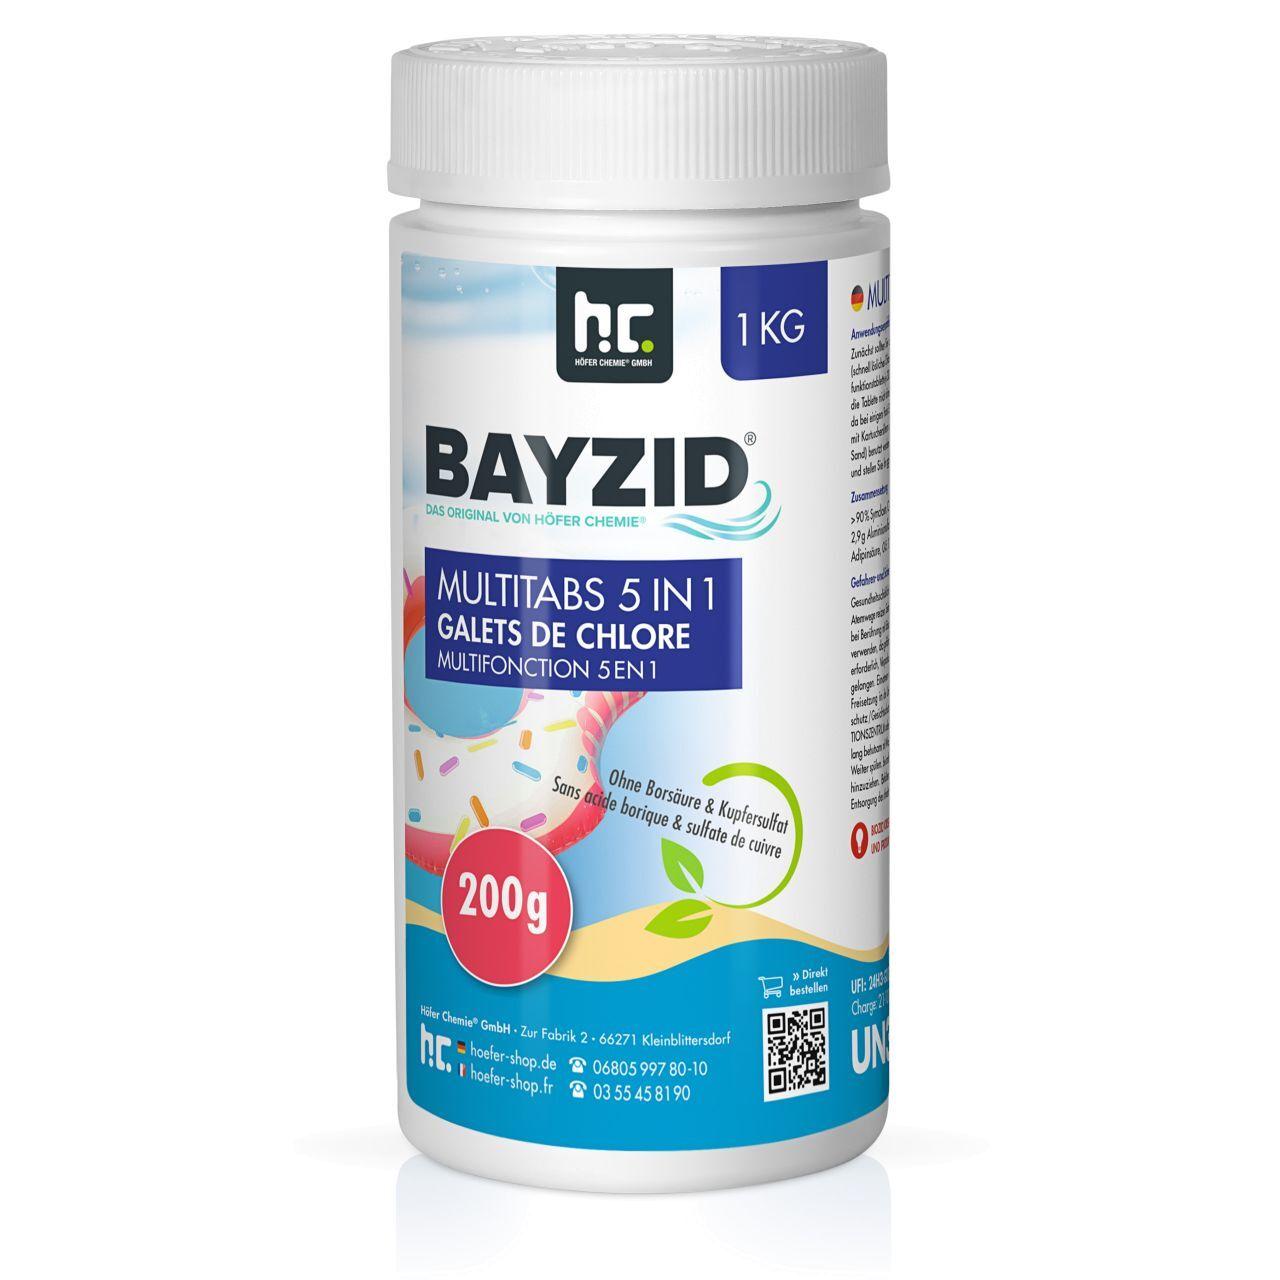 BAYZID 1 kg Galets de chlore multifonction (200g) (1 x 1 kg)